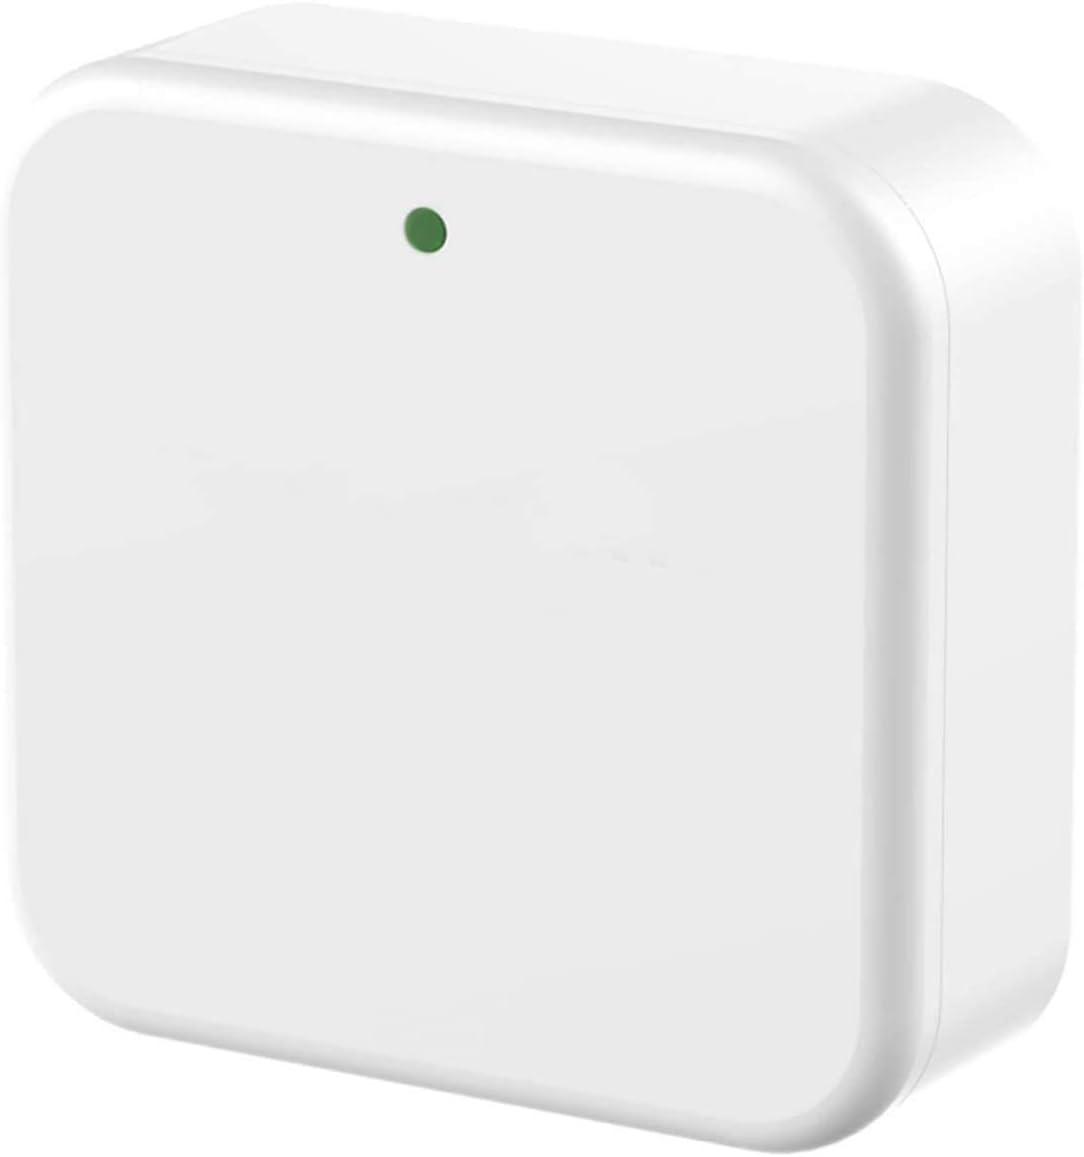 ELLI-Riz G2 Smart Door Lock 2.4G WiFi Gateway/WiFi Bridge, Bluetooth Keyless Entry Door Lock Gateway, Remotely Control Bluetooth Lock Works for TTLock App, Compatible with Alexa, Echo & Google Home